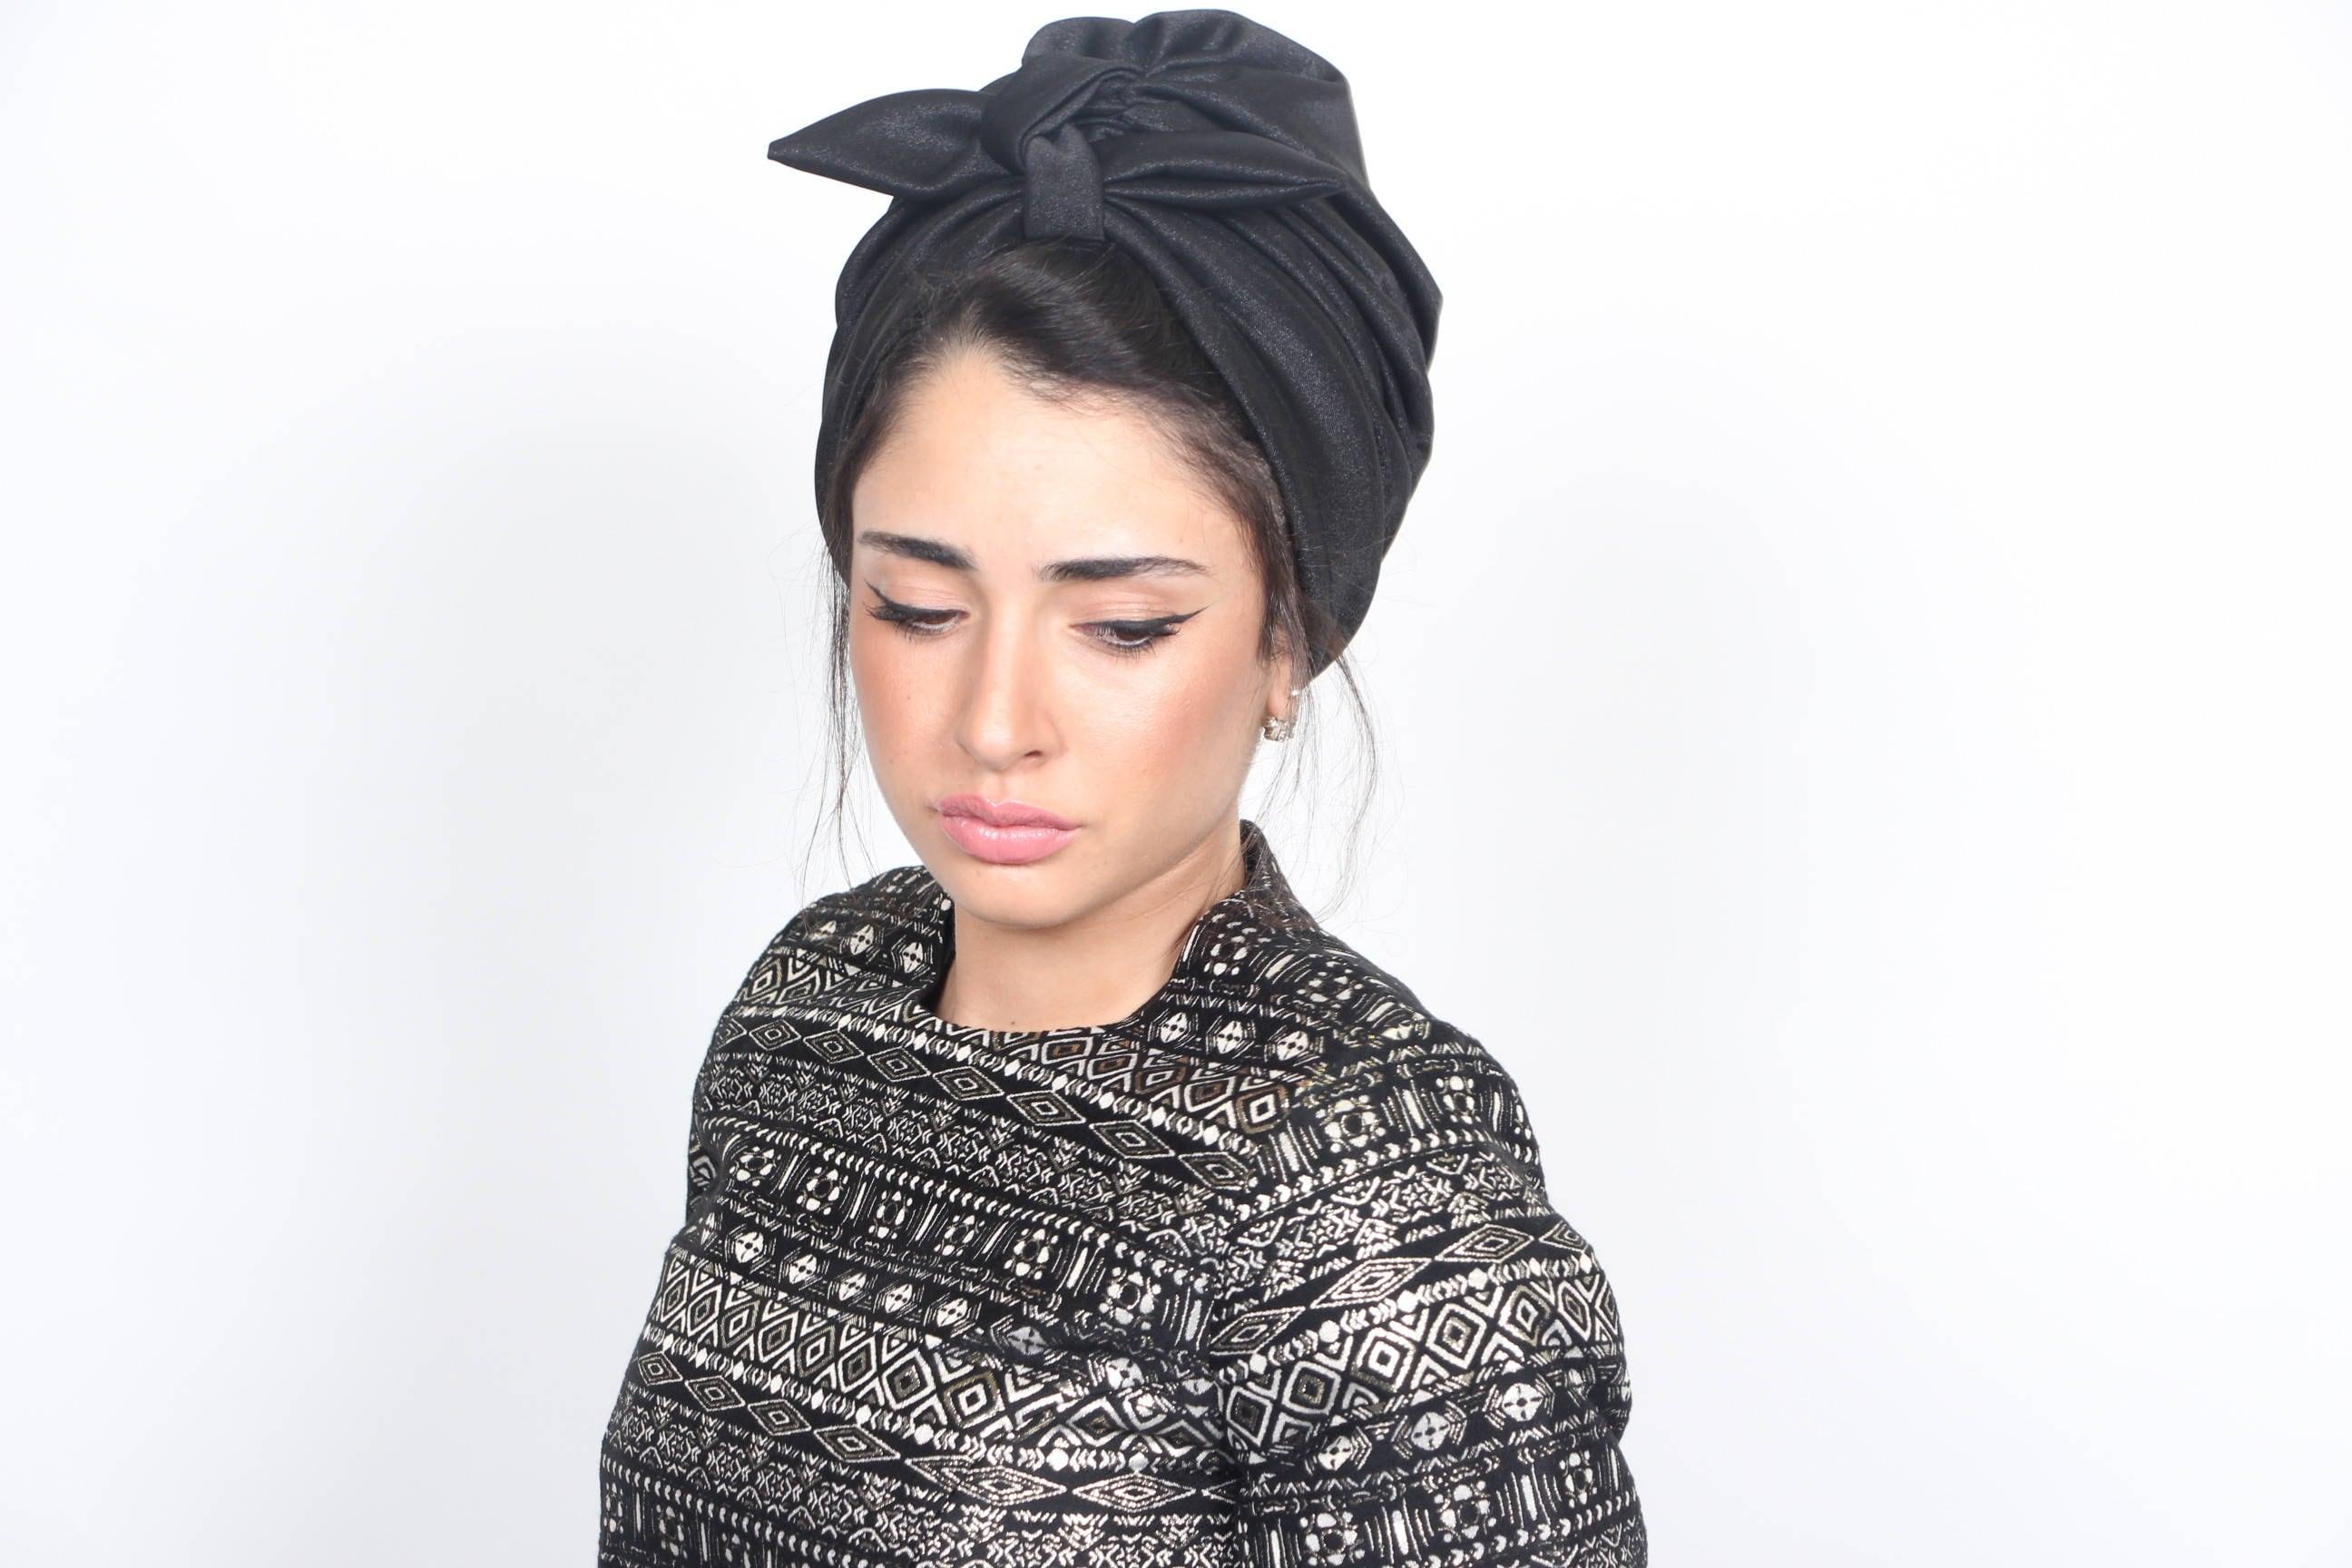 tichel mitpachat head wraps women\'s head scarf head | Etsy